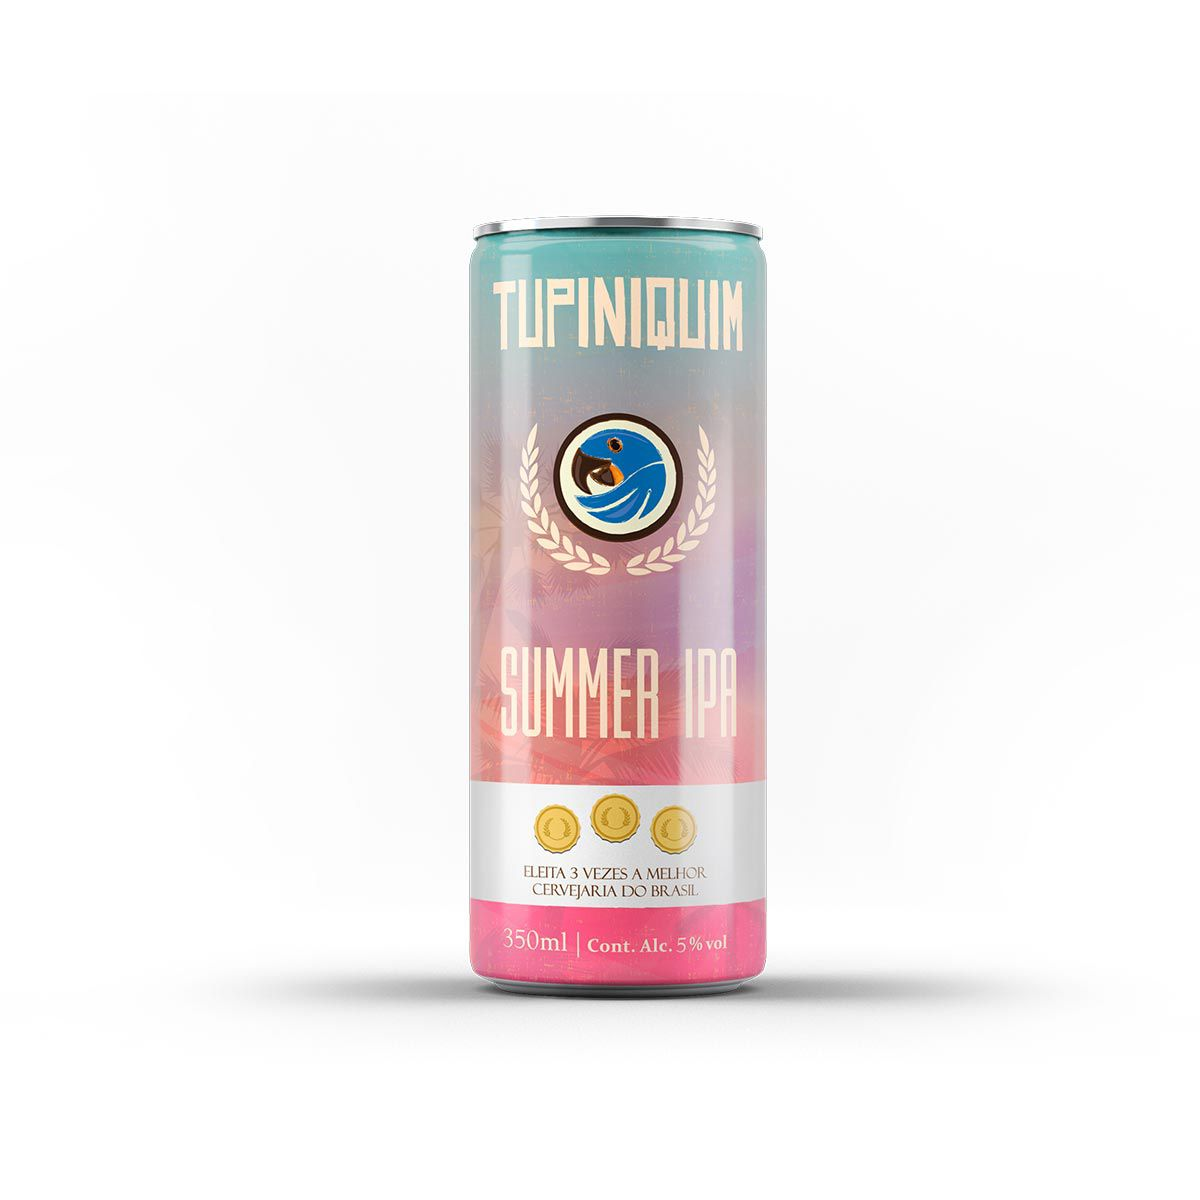 Tupiniquim Summer IPA 350ml lata  - RS BEER - Cervejas Gaúchas